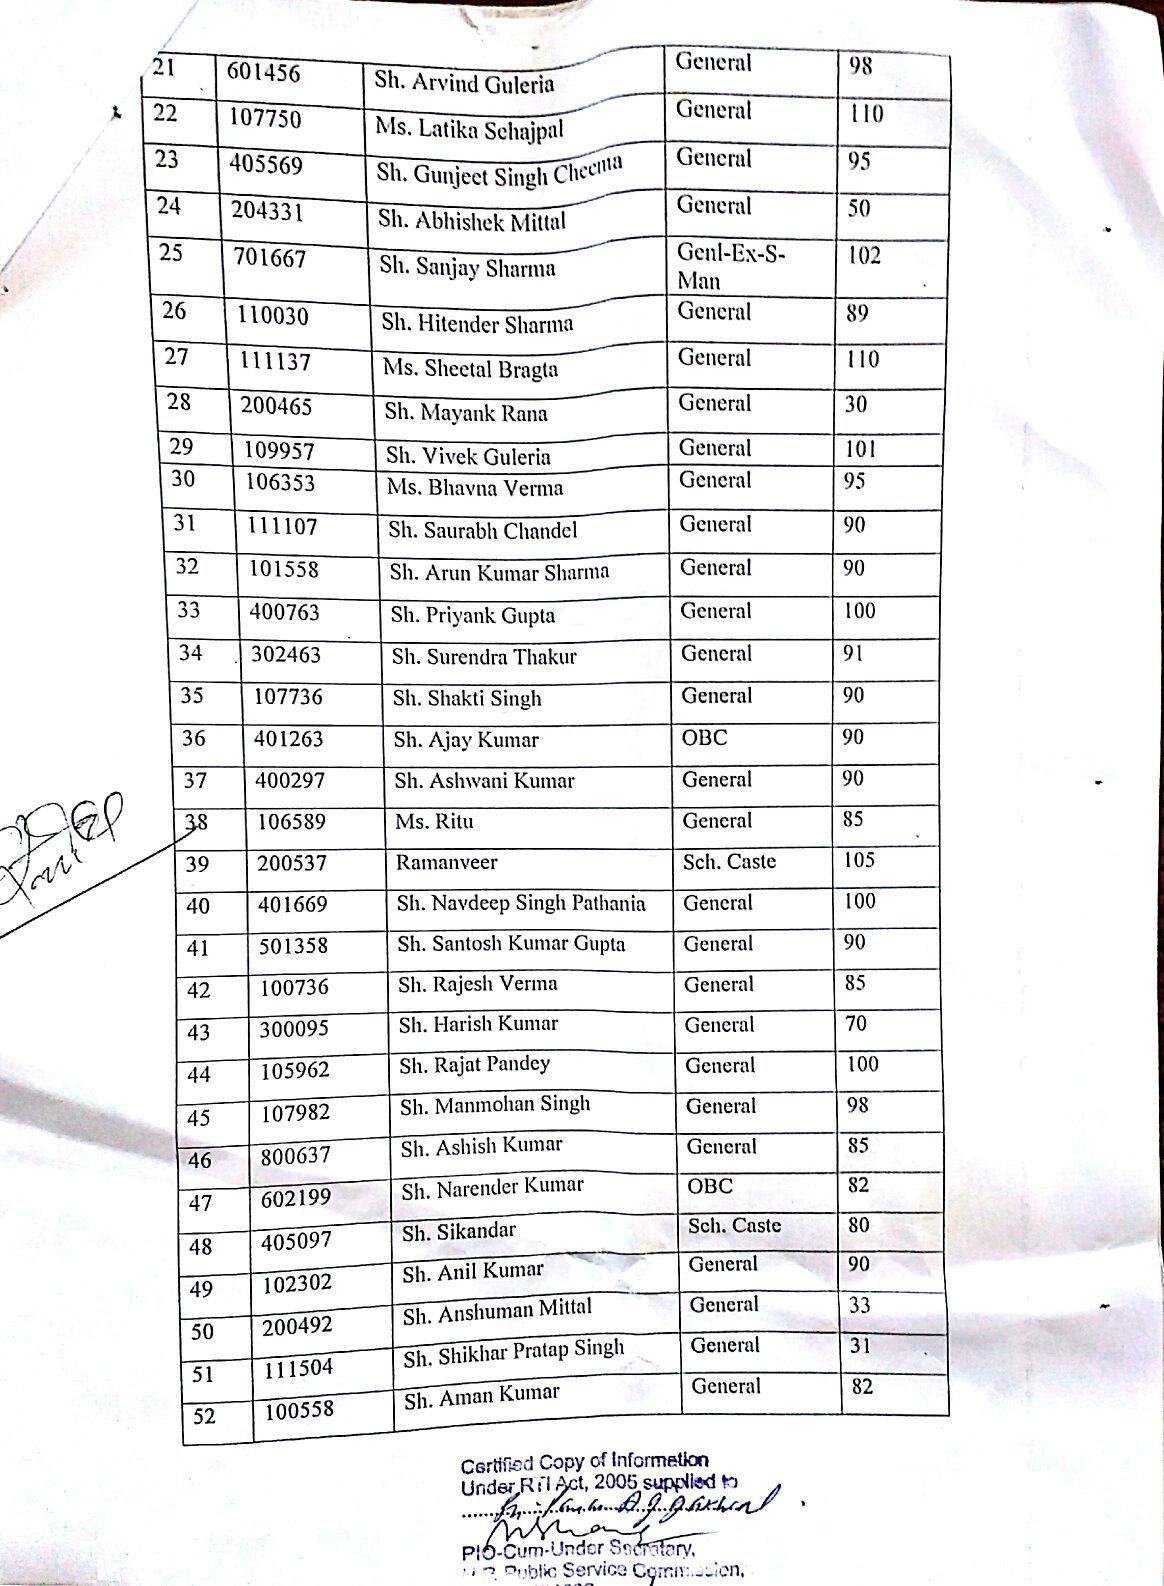 Khadubhai IAS: [HPAS MAINS 2014] HPAS 2014 Mains Exam